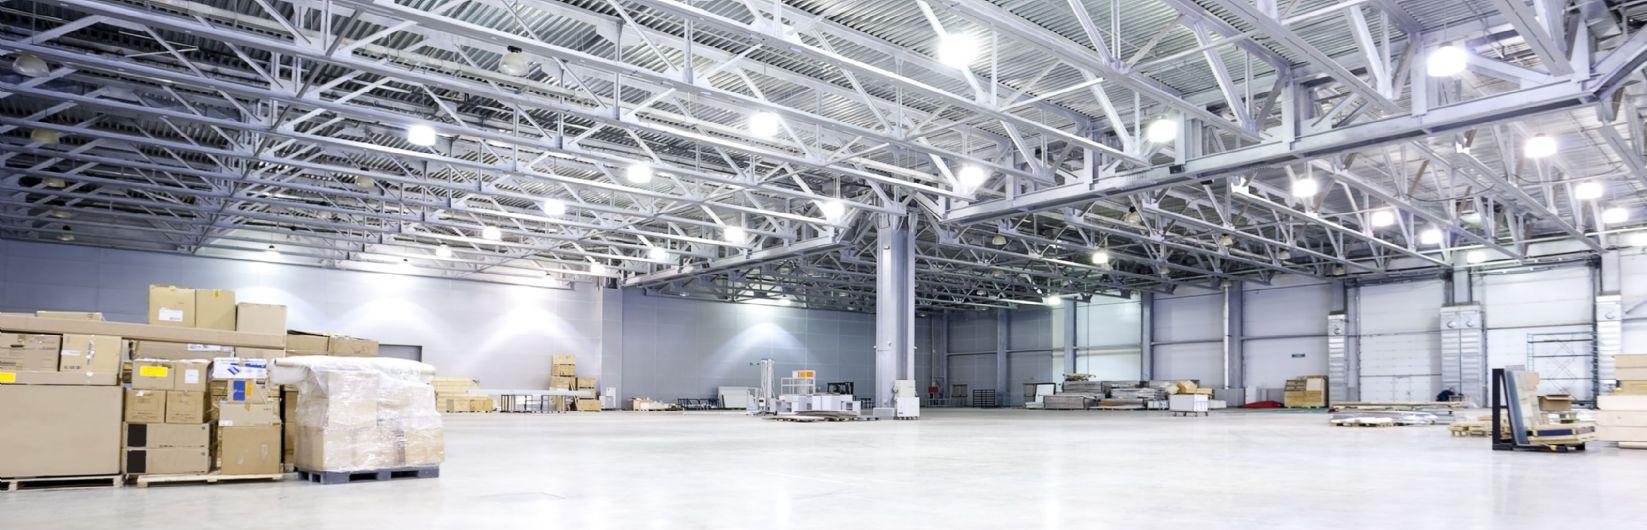 Savills Bahrain | Industrial Investment